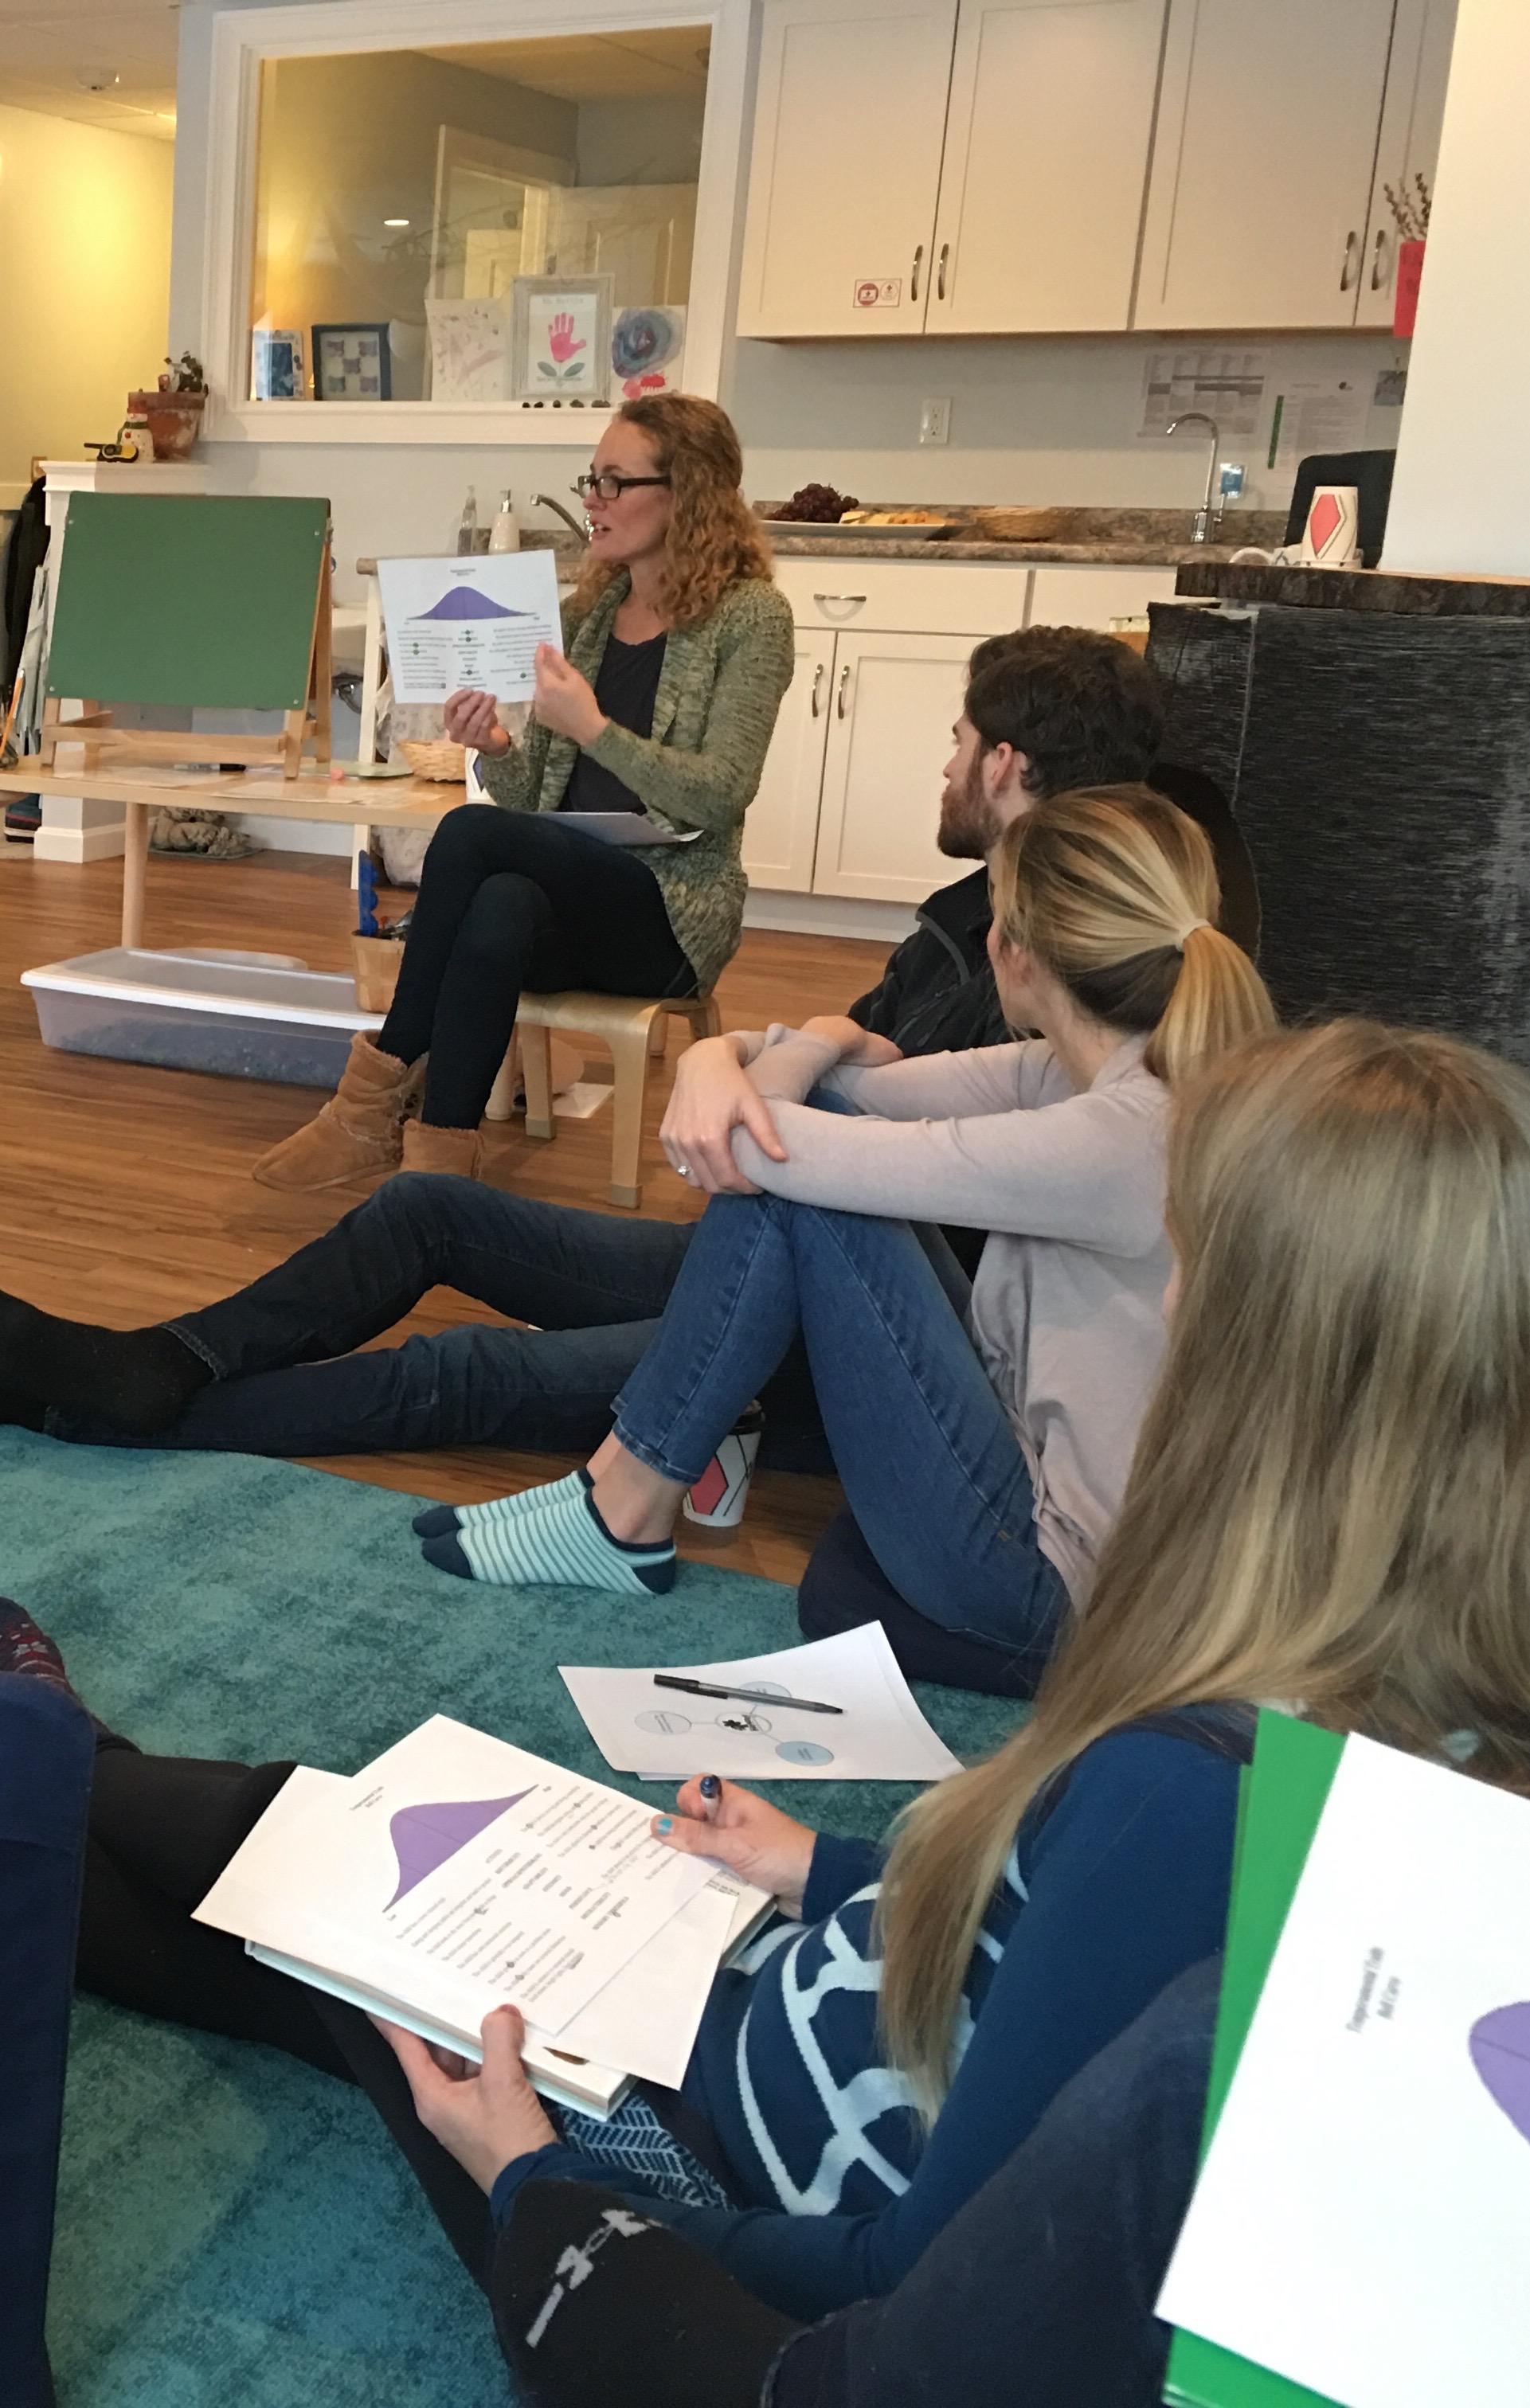 Chrissy Rupp Parent Retreat Harmony Natural Learning Center.jpg